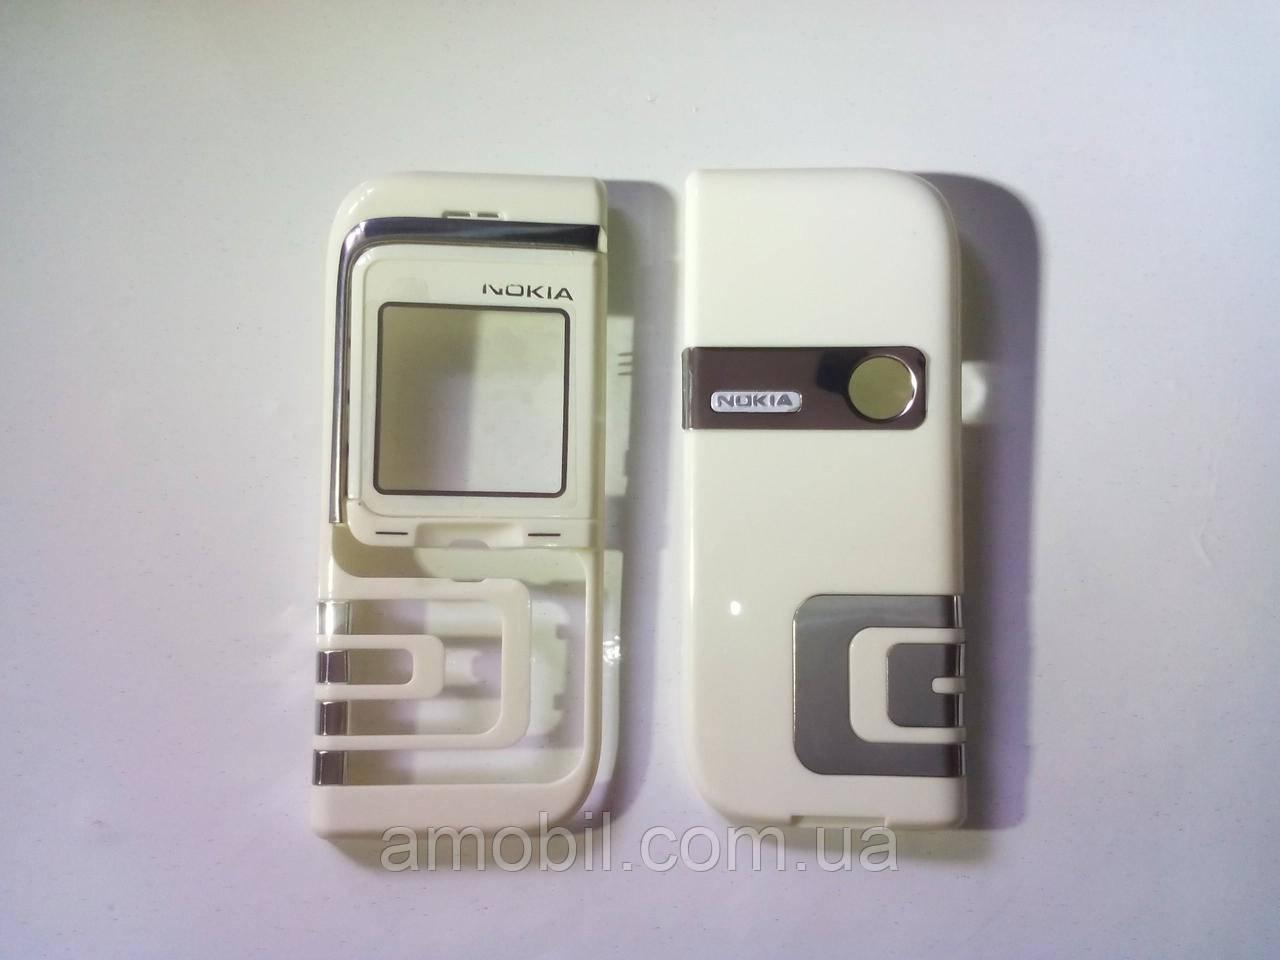 Корпус Nokia 7260 white